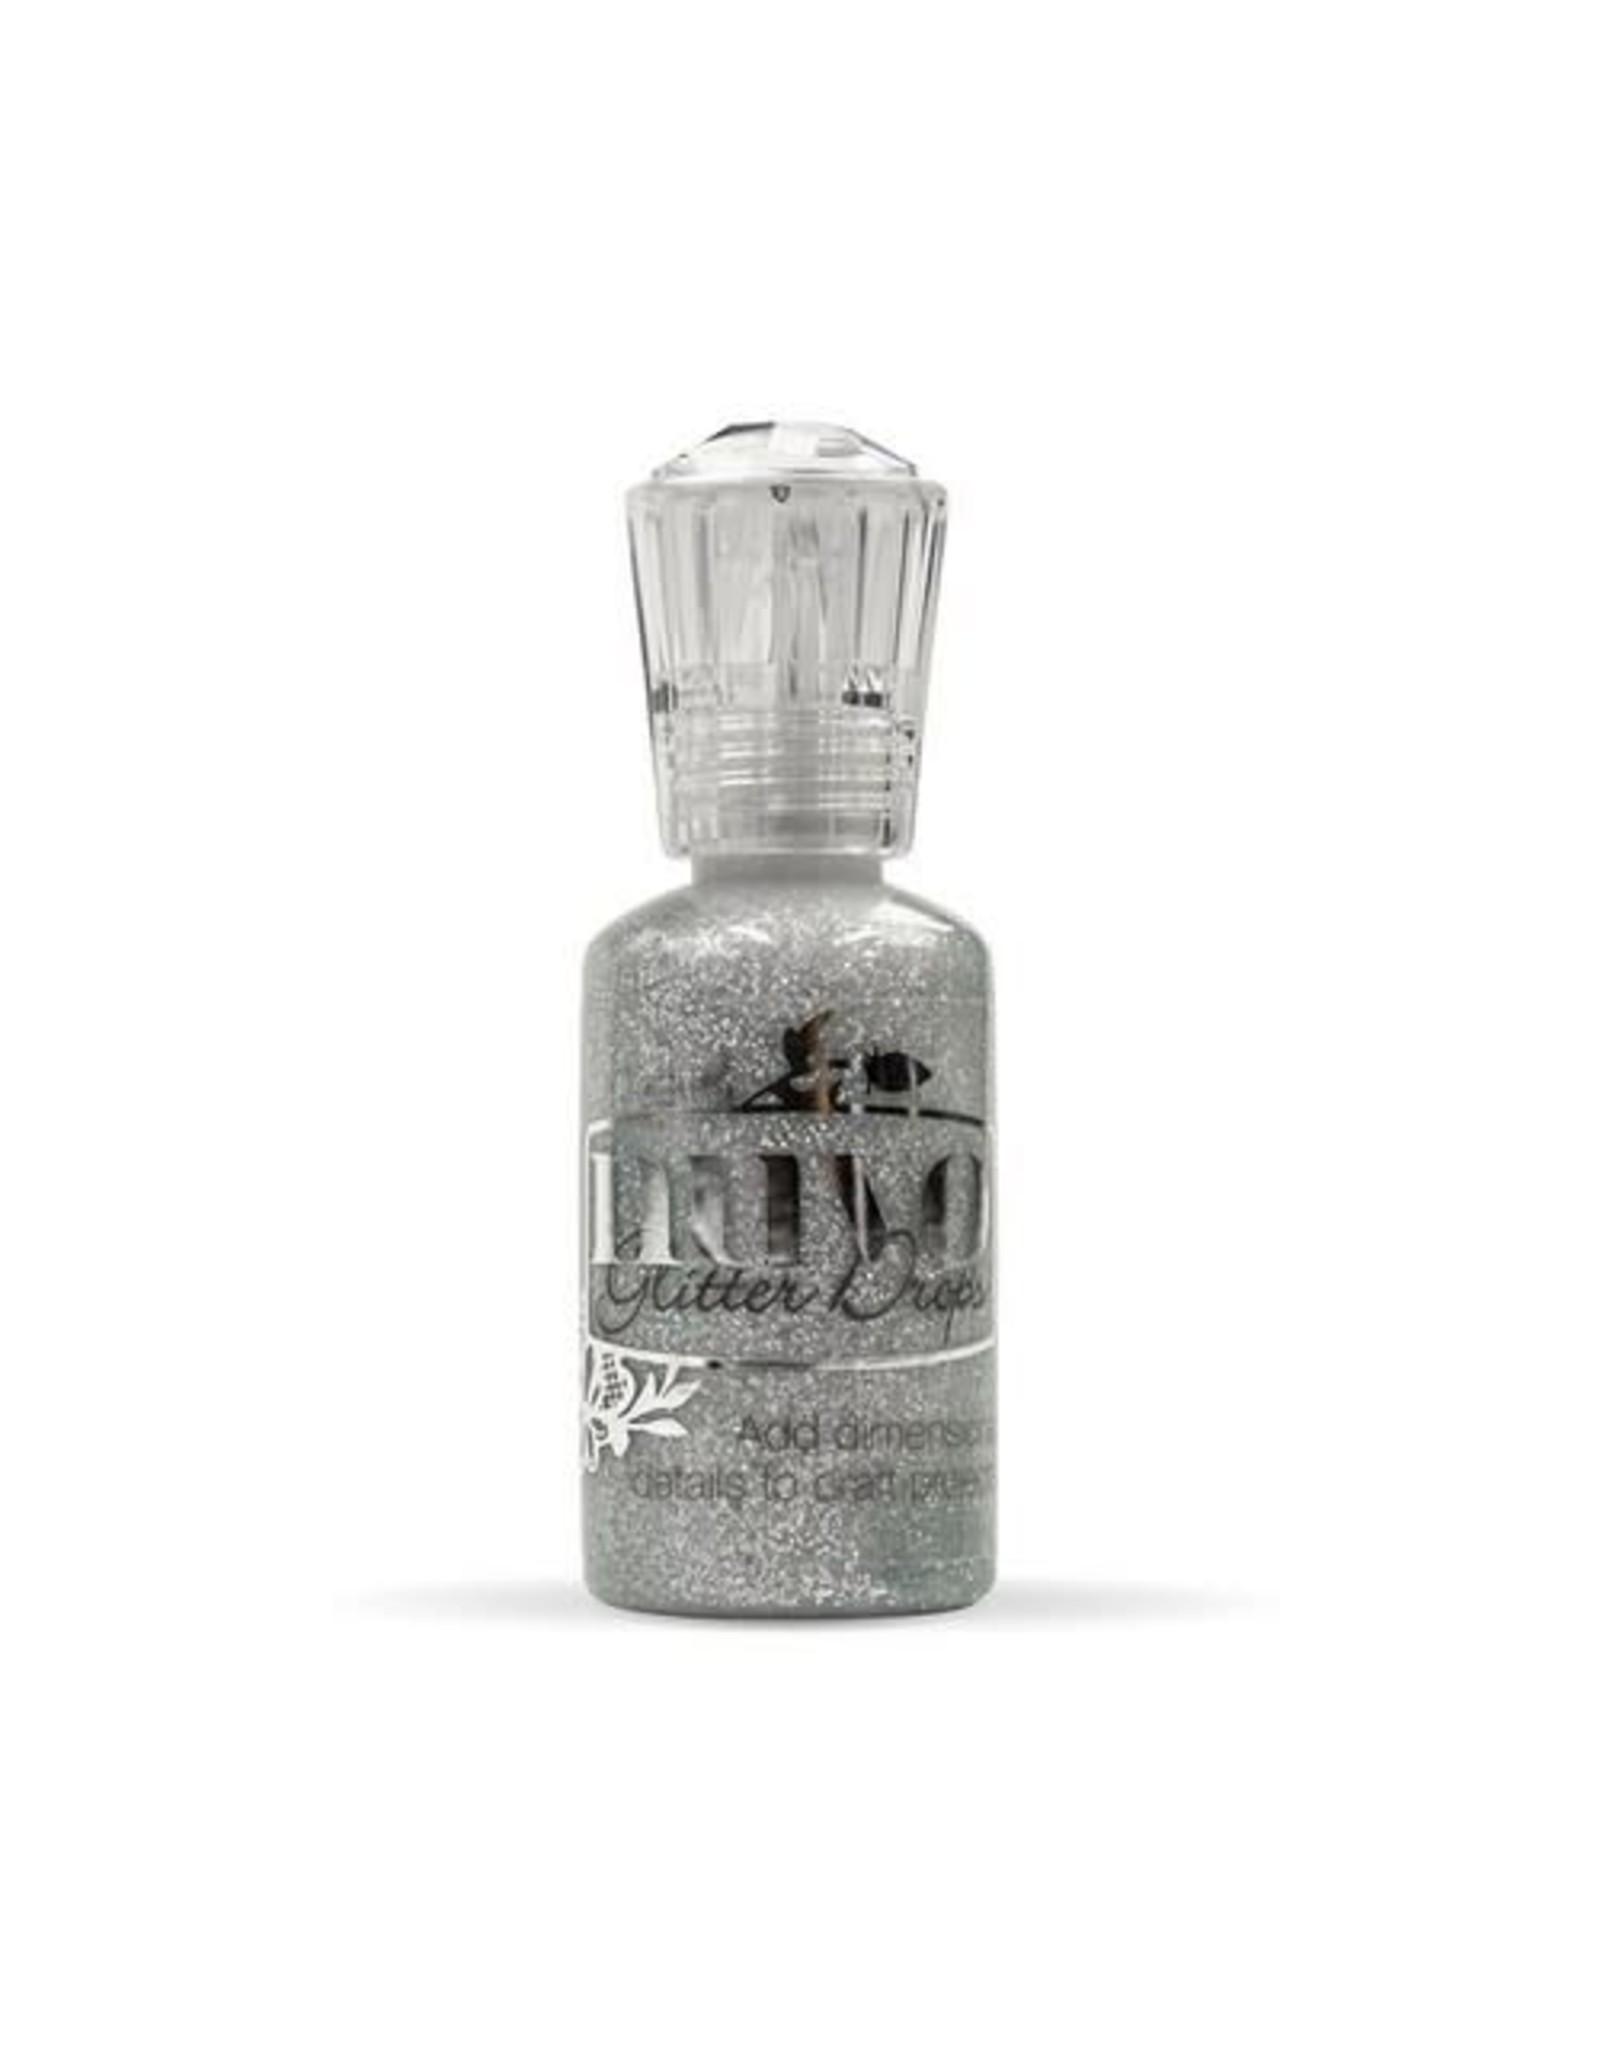 Nuvo by tonic nuvo glitter drops- silvermoondust 756N